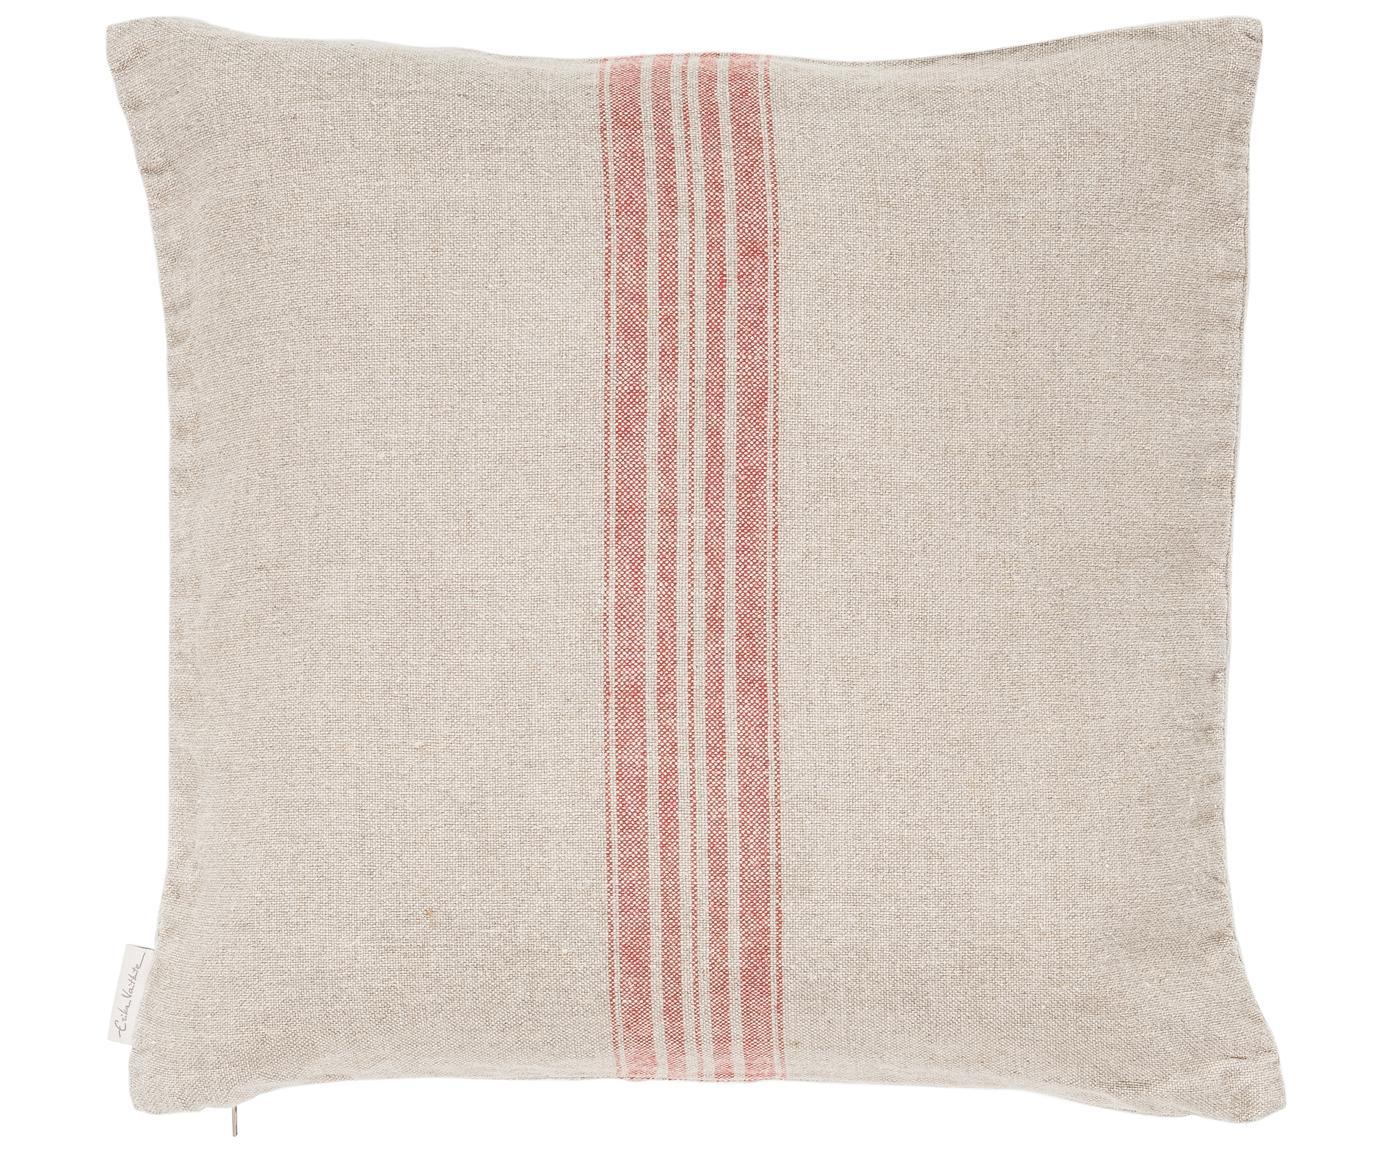 Federa arredo in lino Jara, Beige, rosso, Larg. 40 x Lung. 40 cm